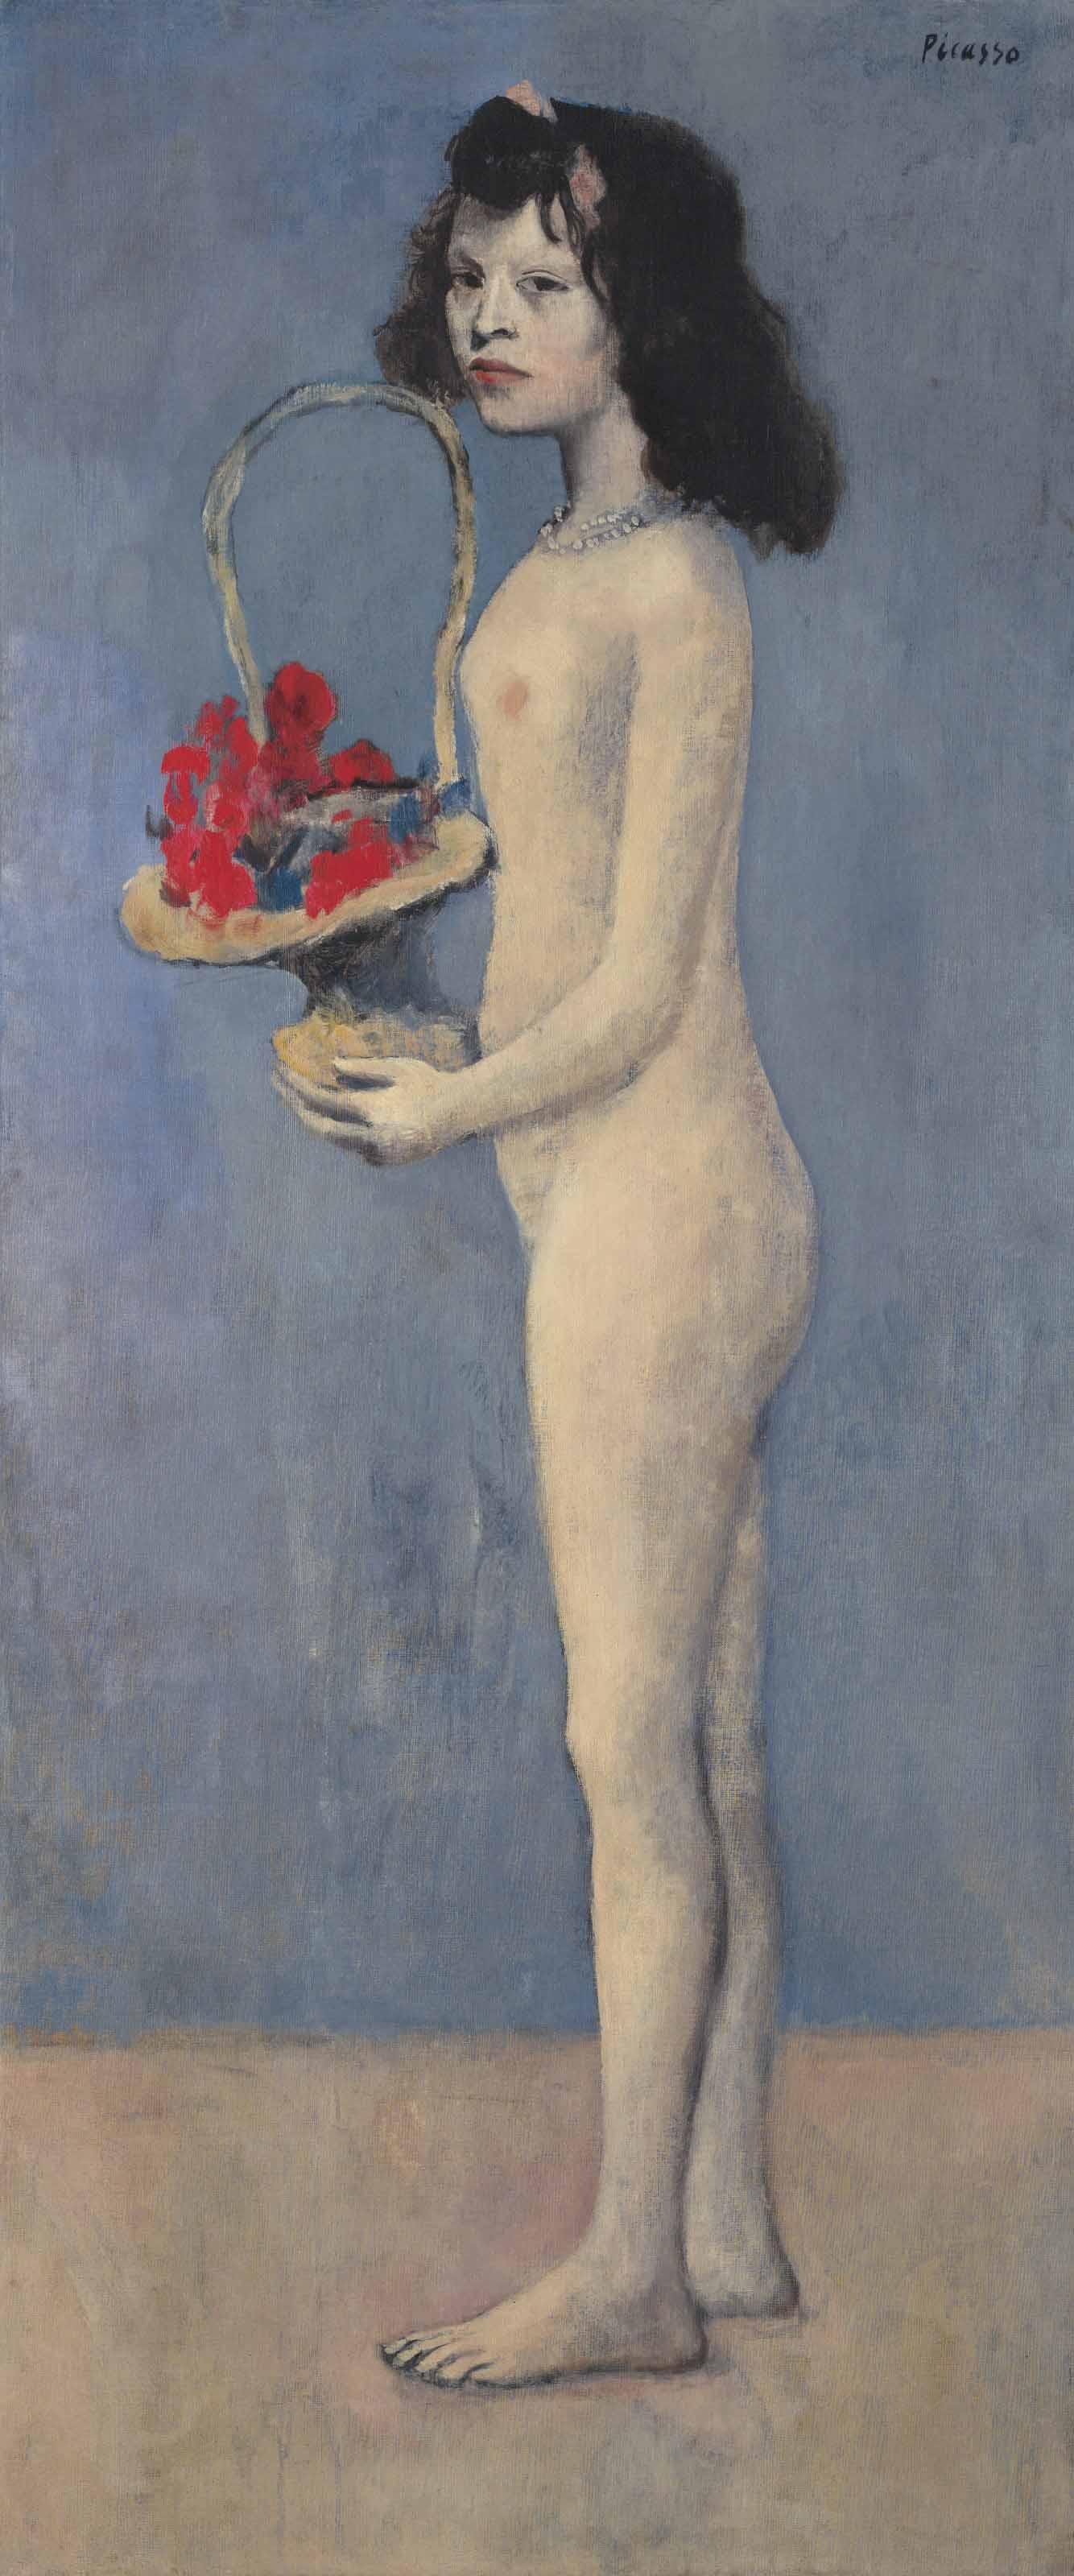 Image result for Fillette à la corbeille fleurie picasso